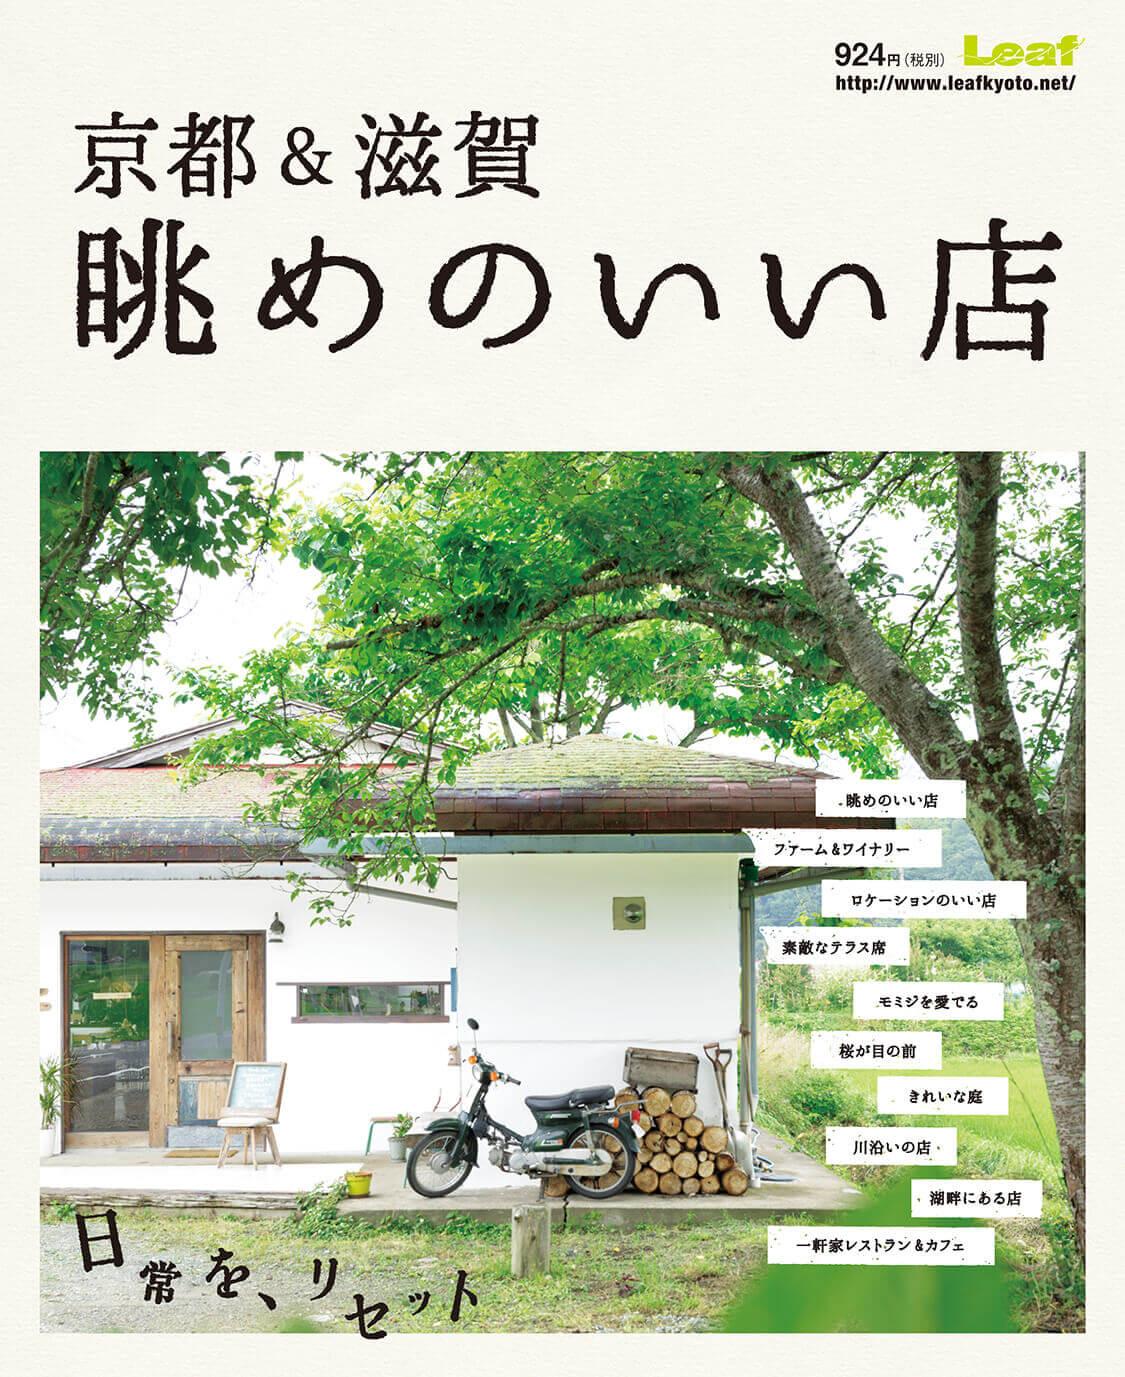 LeafMOOK - 【書籍】京都 & 滋賀 眺めのいい店